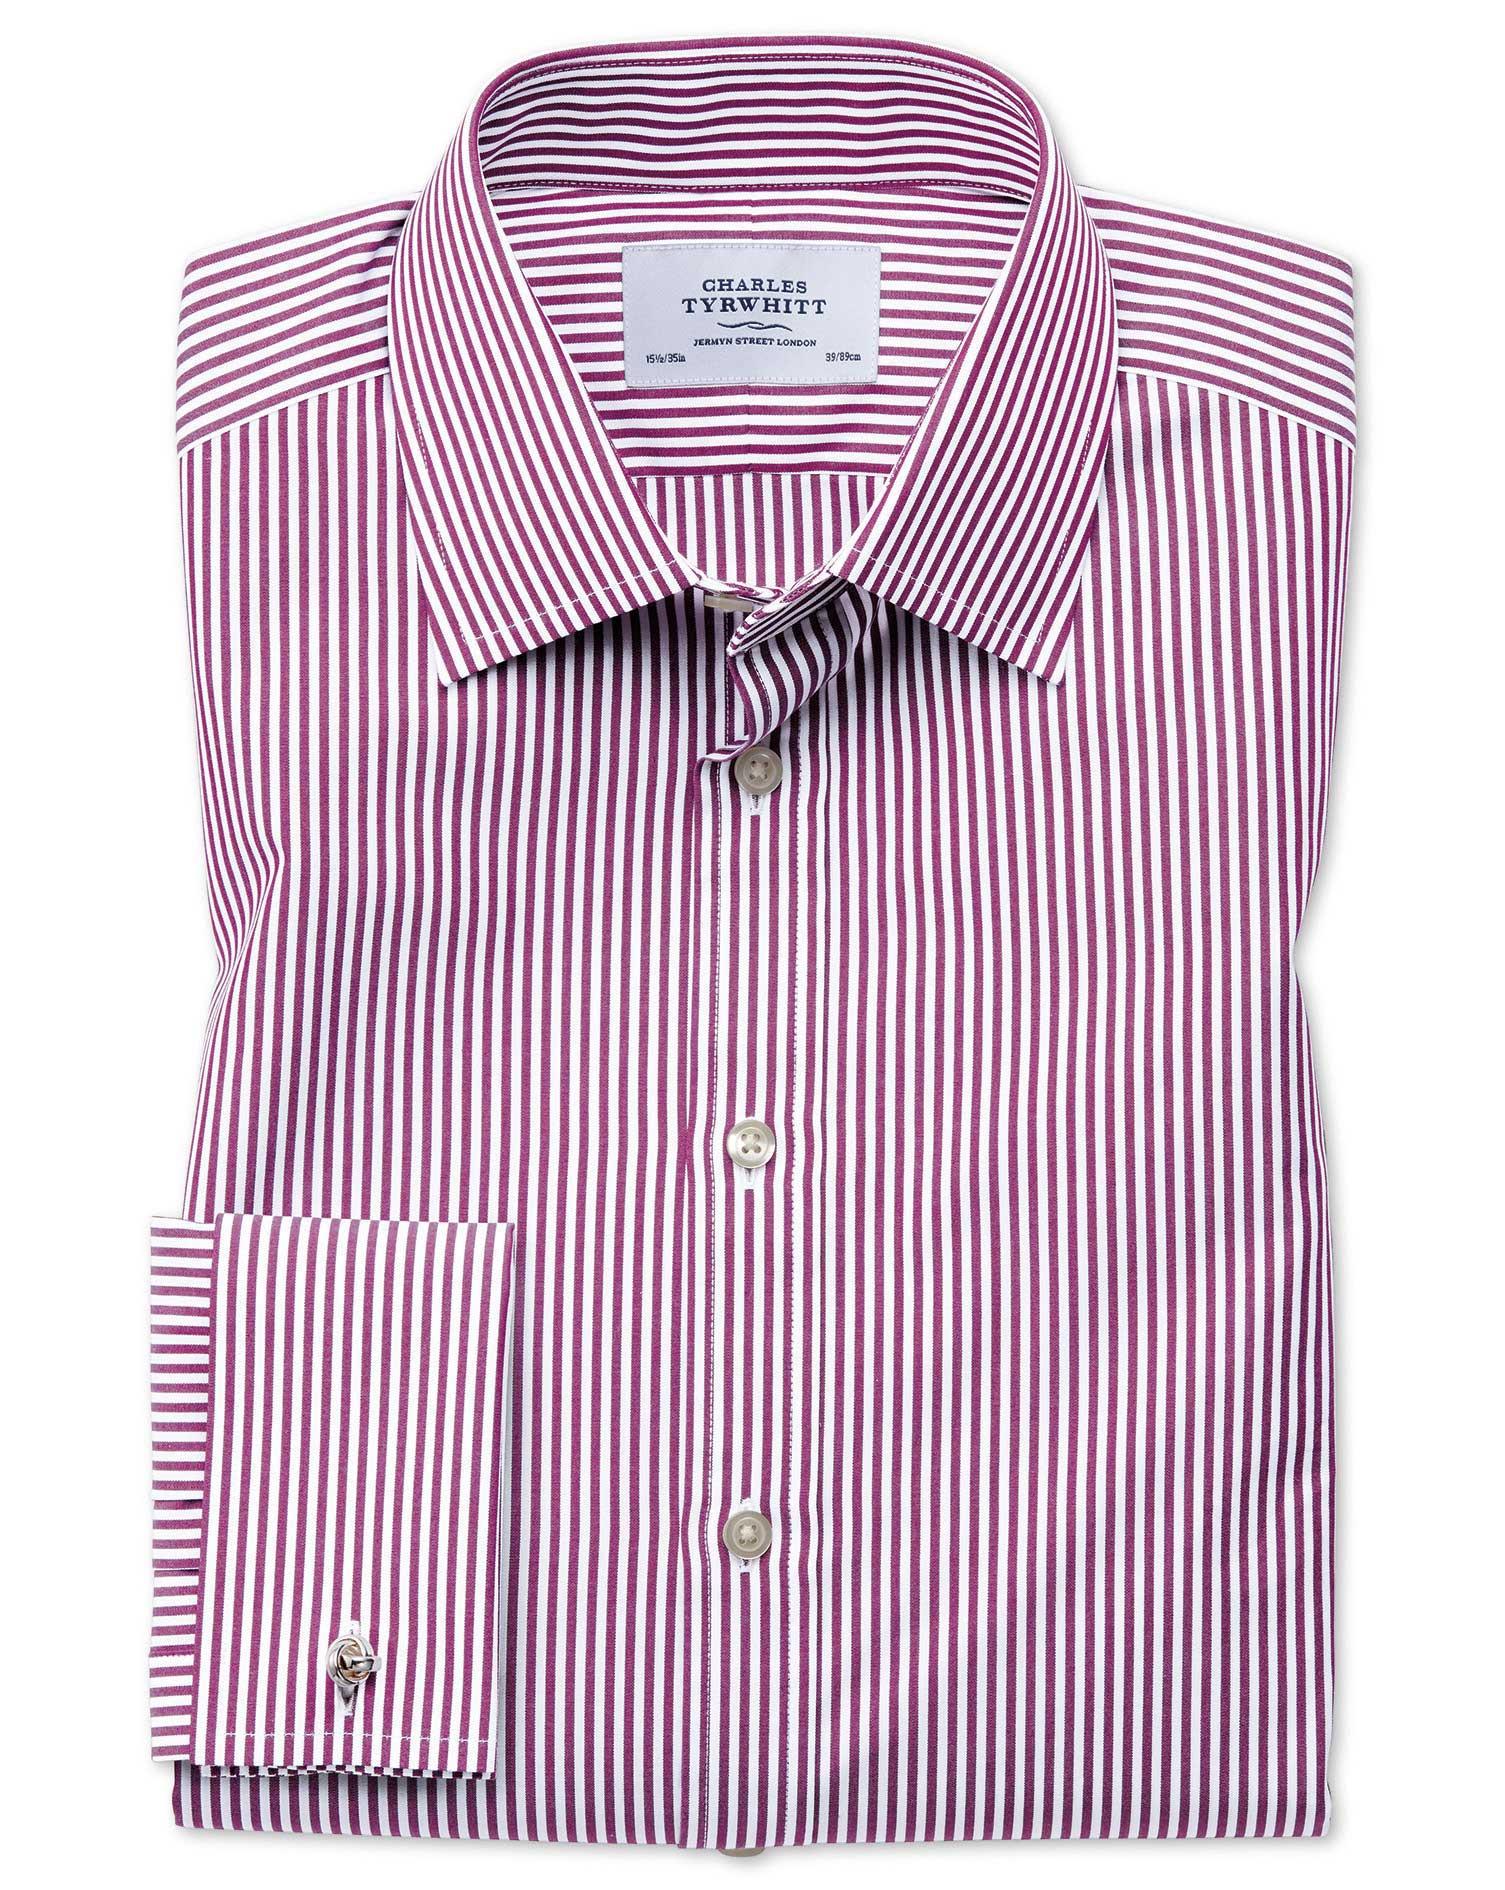 Classic Fit Bengal Stripe Purple Cotton Formal Shirt Single Cuff Size 15.5/34 by Charles Tyrwhitt